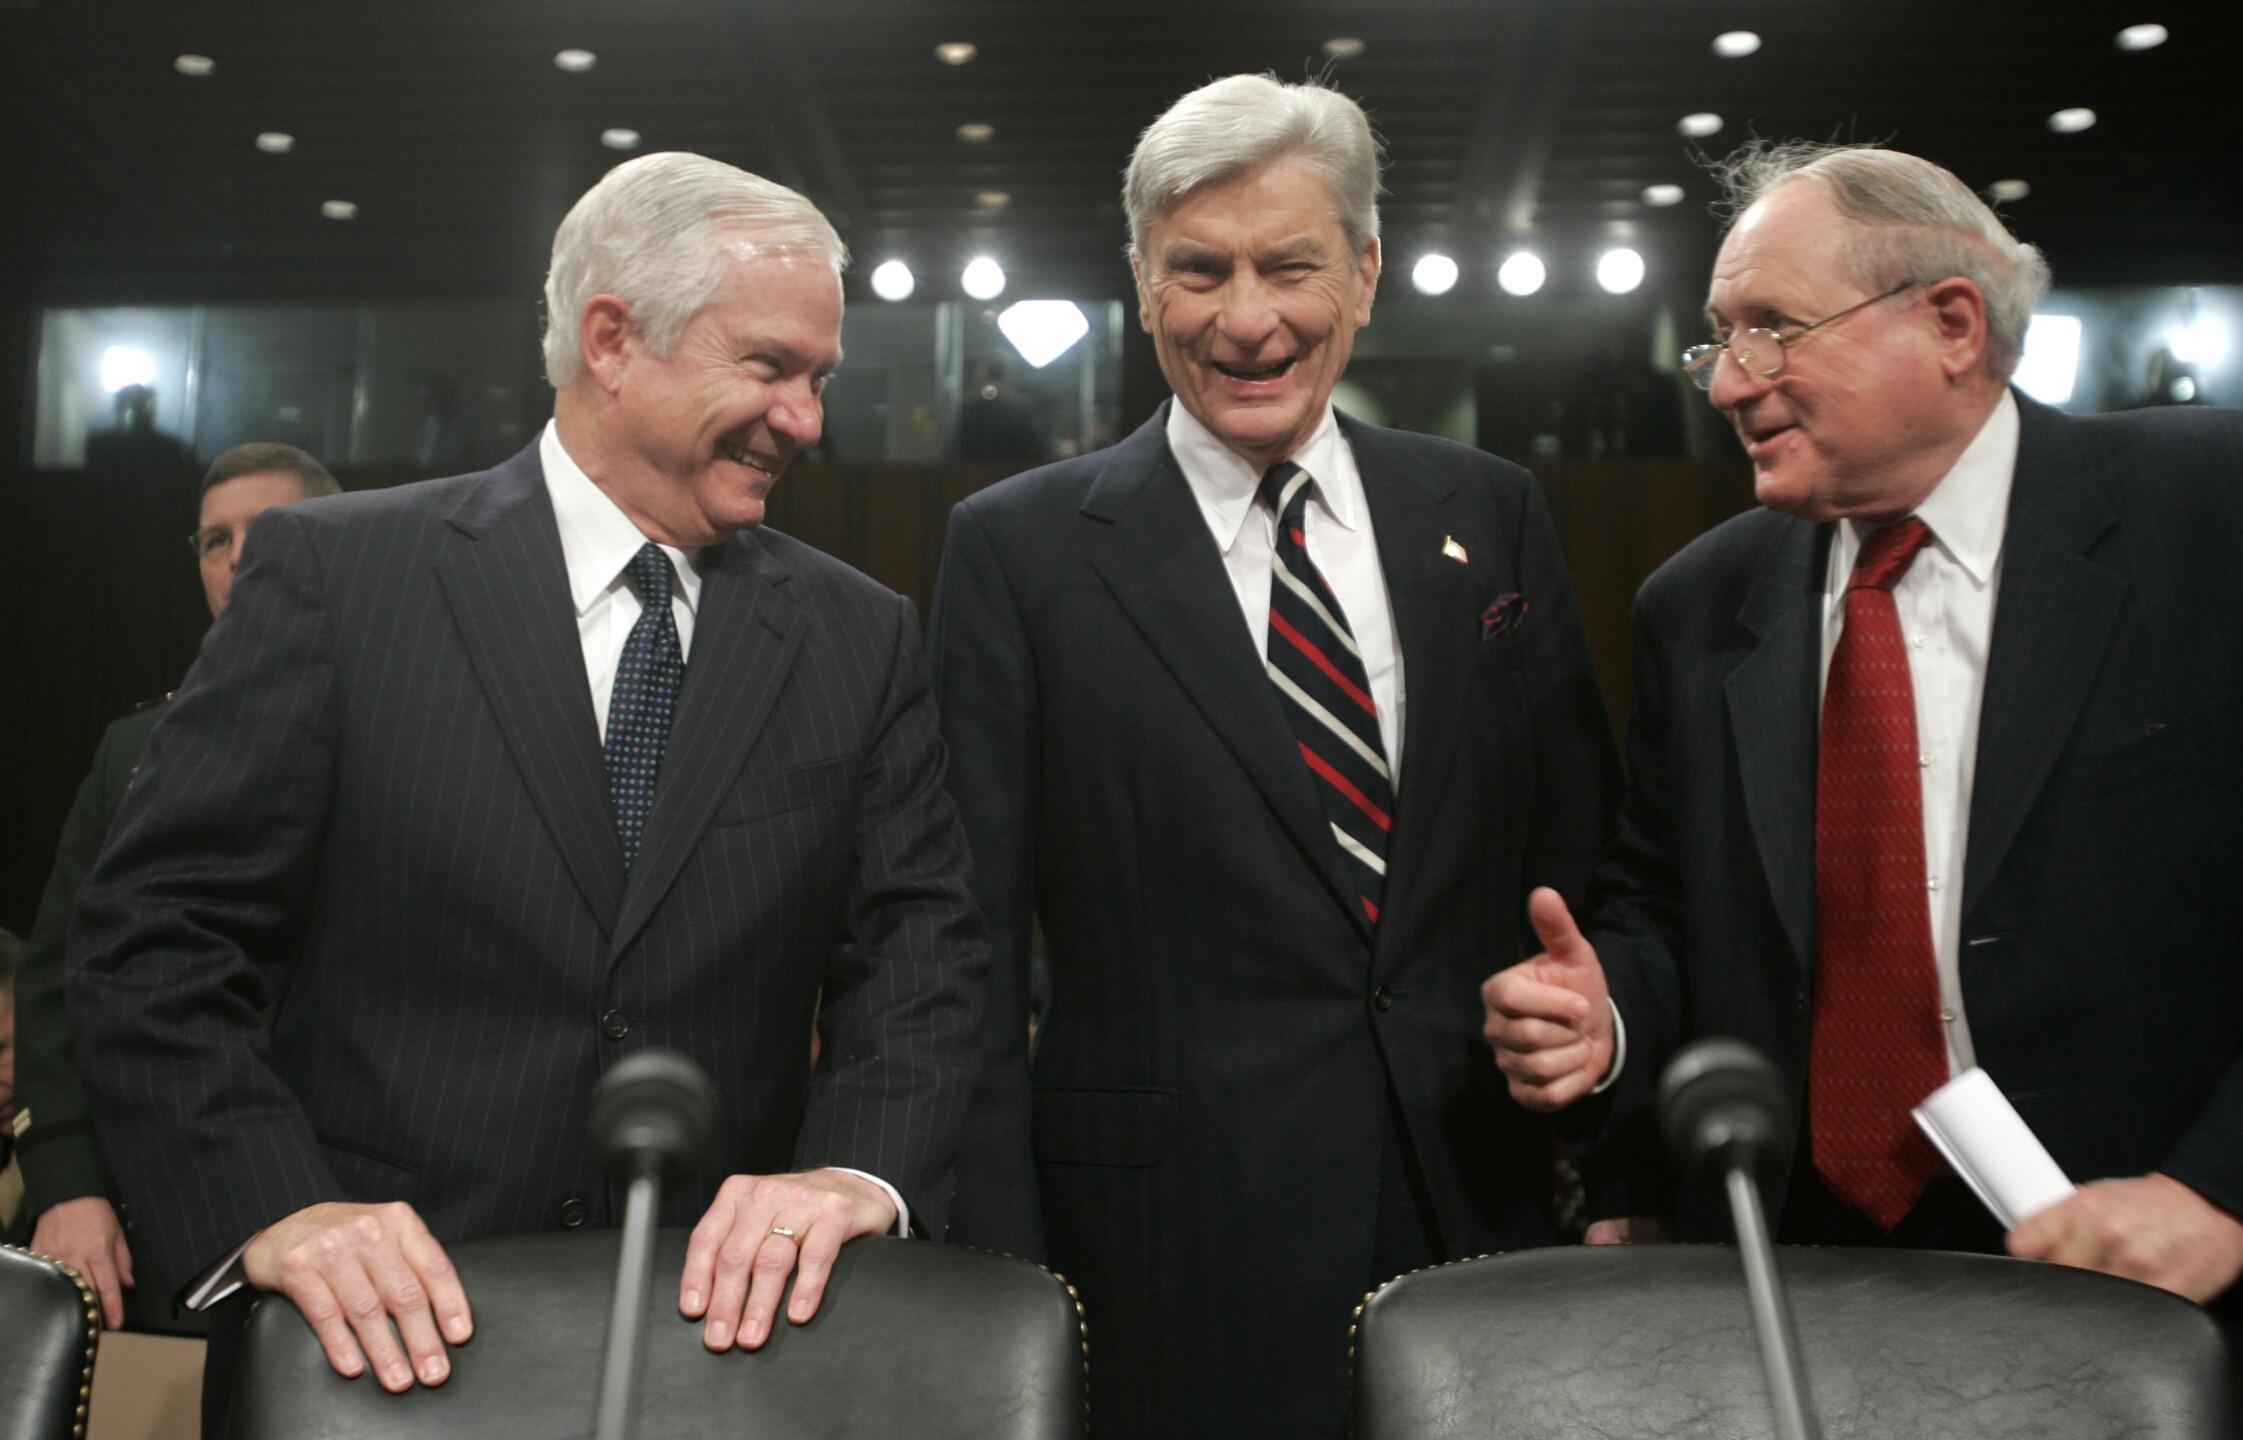 Robert Gates, John Warner, Carl Levin